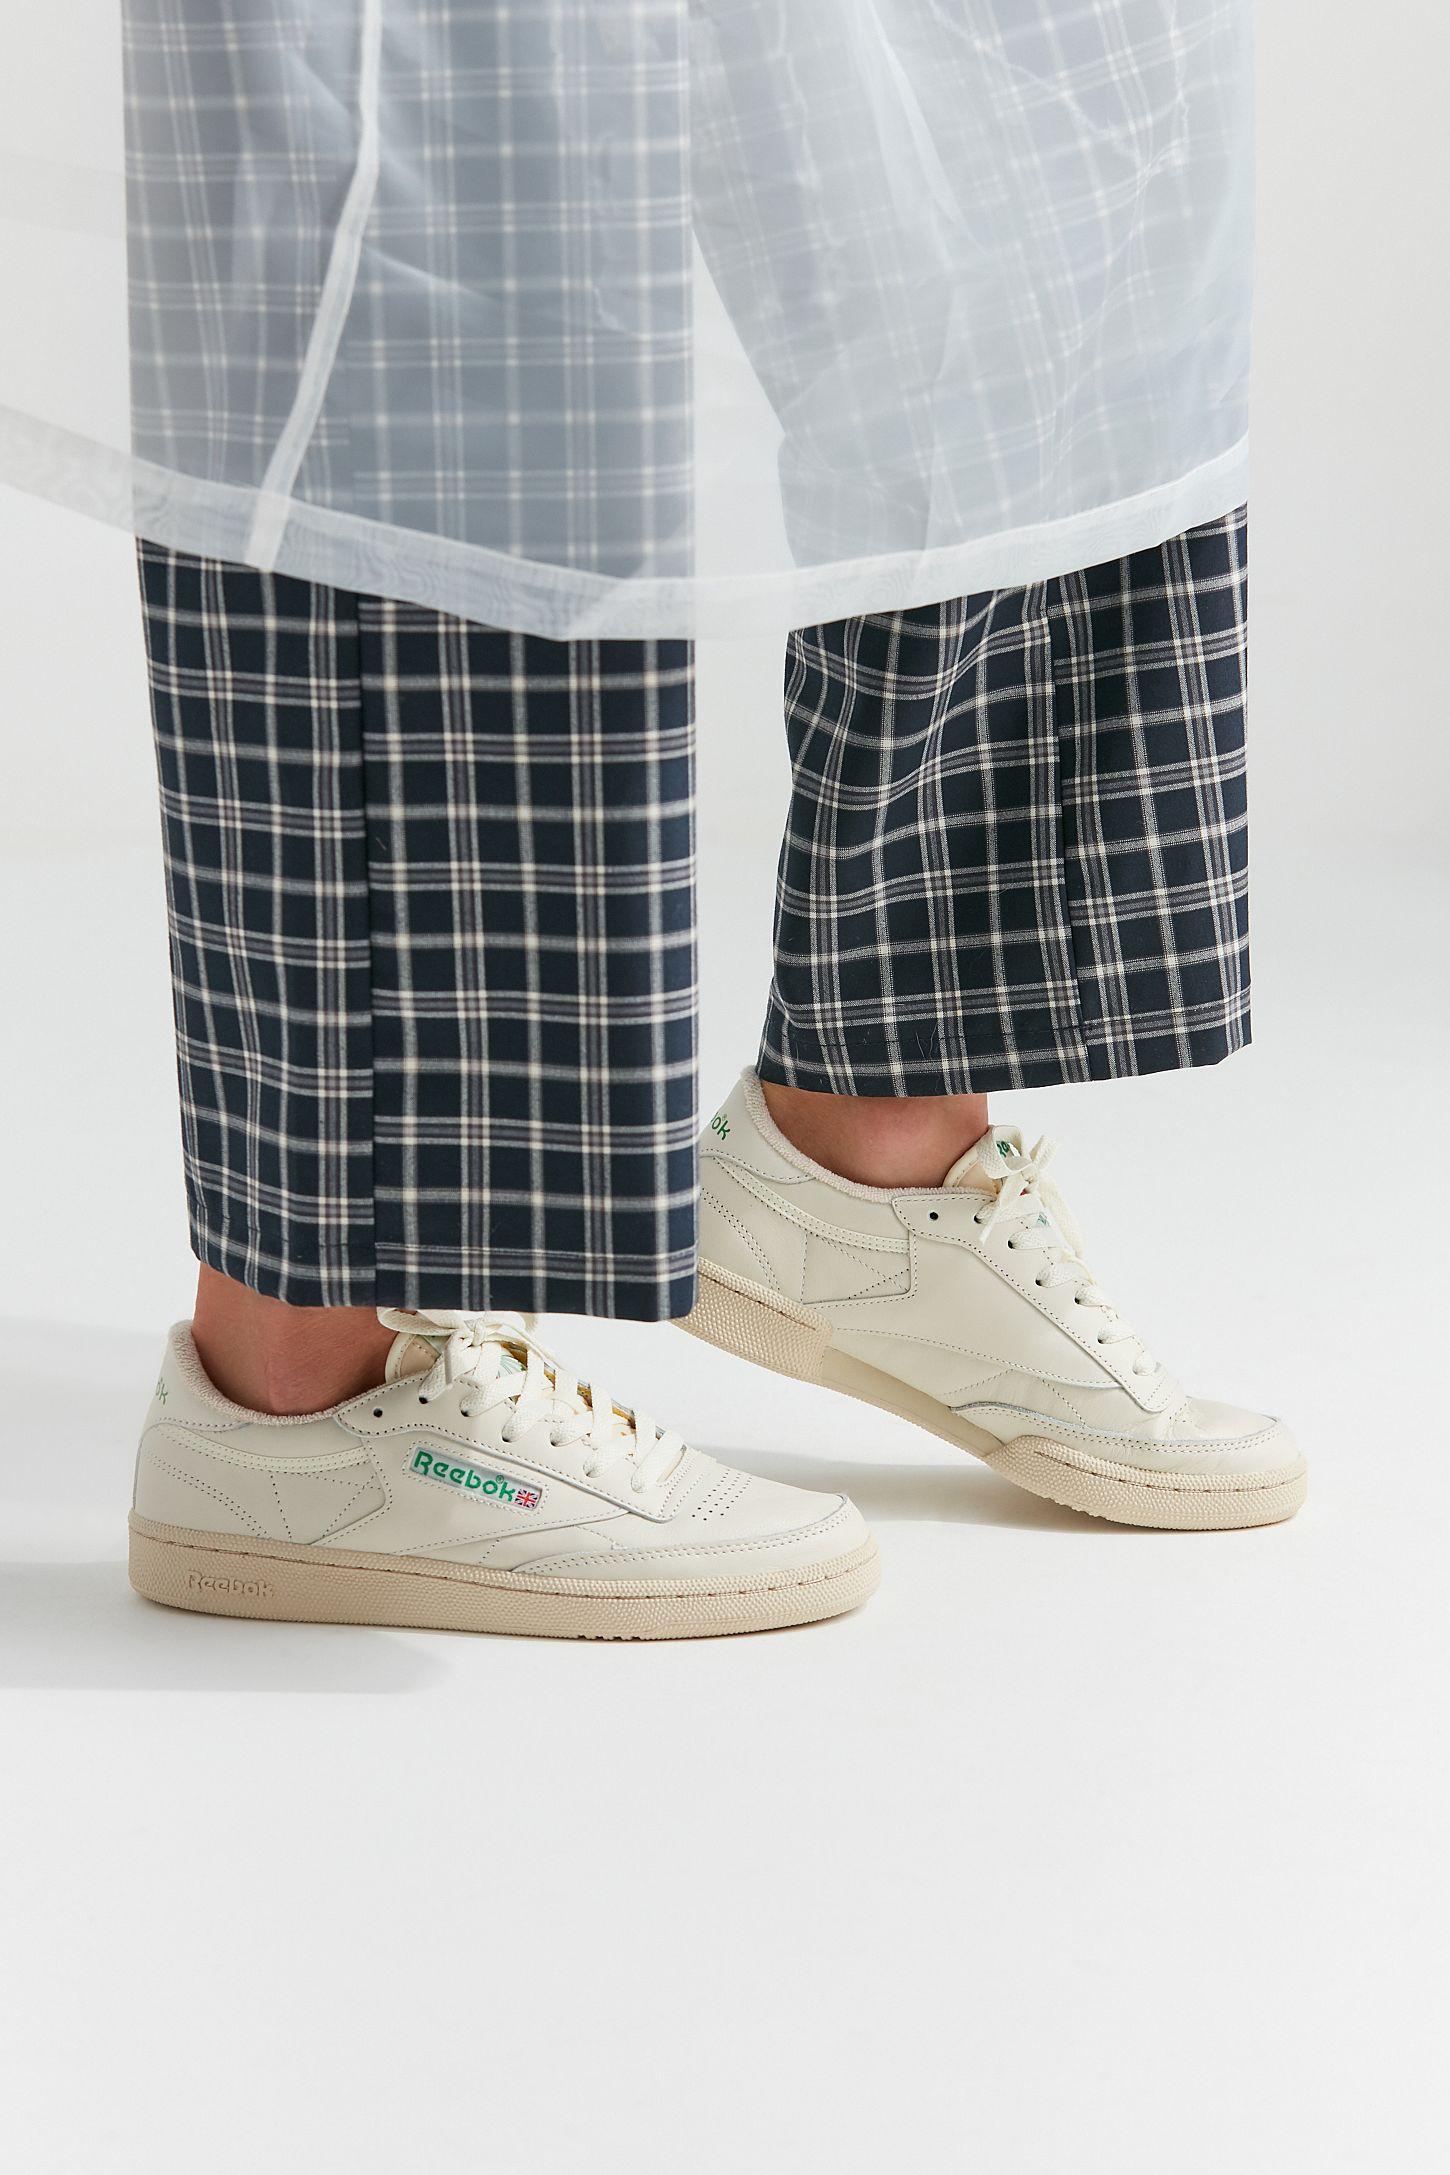 dd46b849a6741 Slide View  6  Reebok Club C Vintage Sneaker